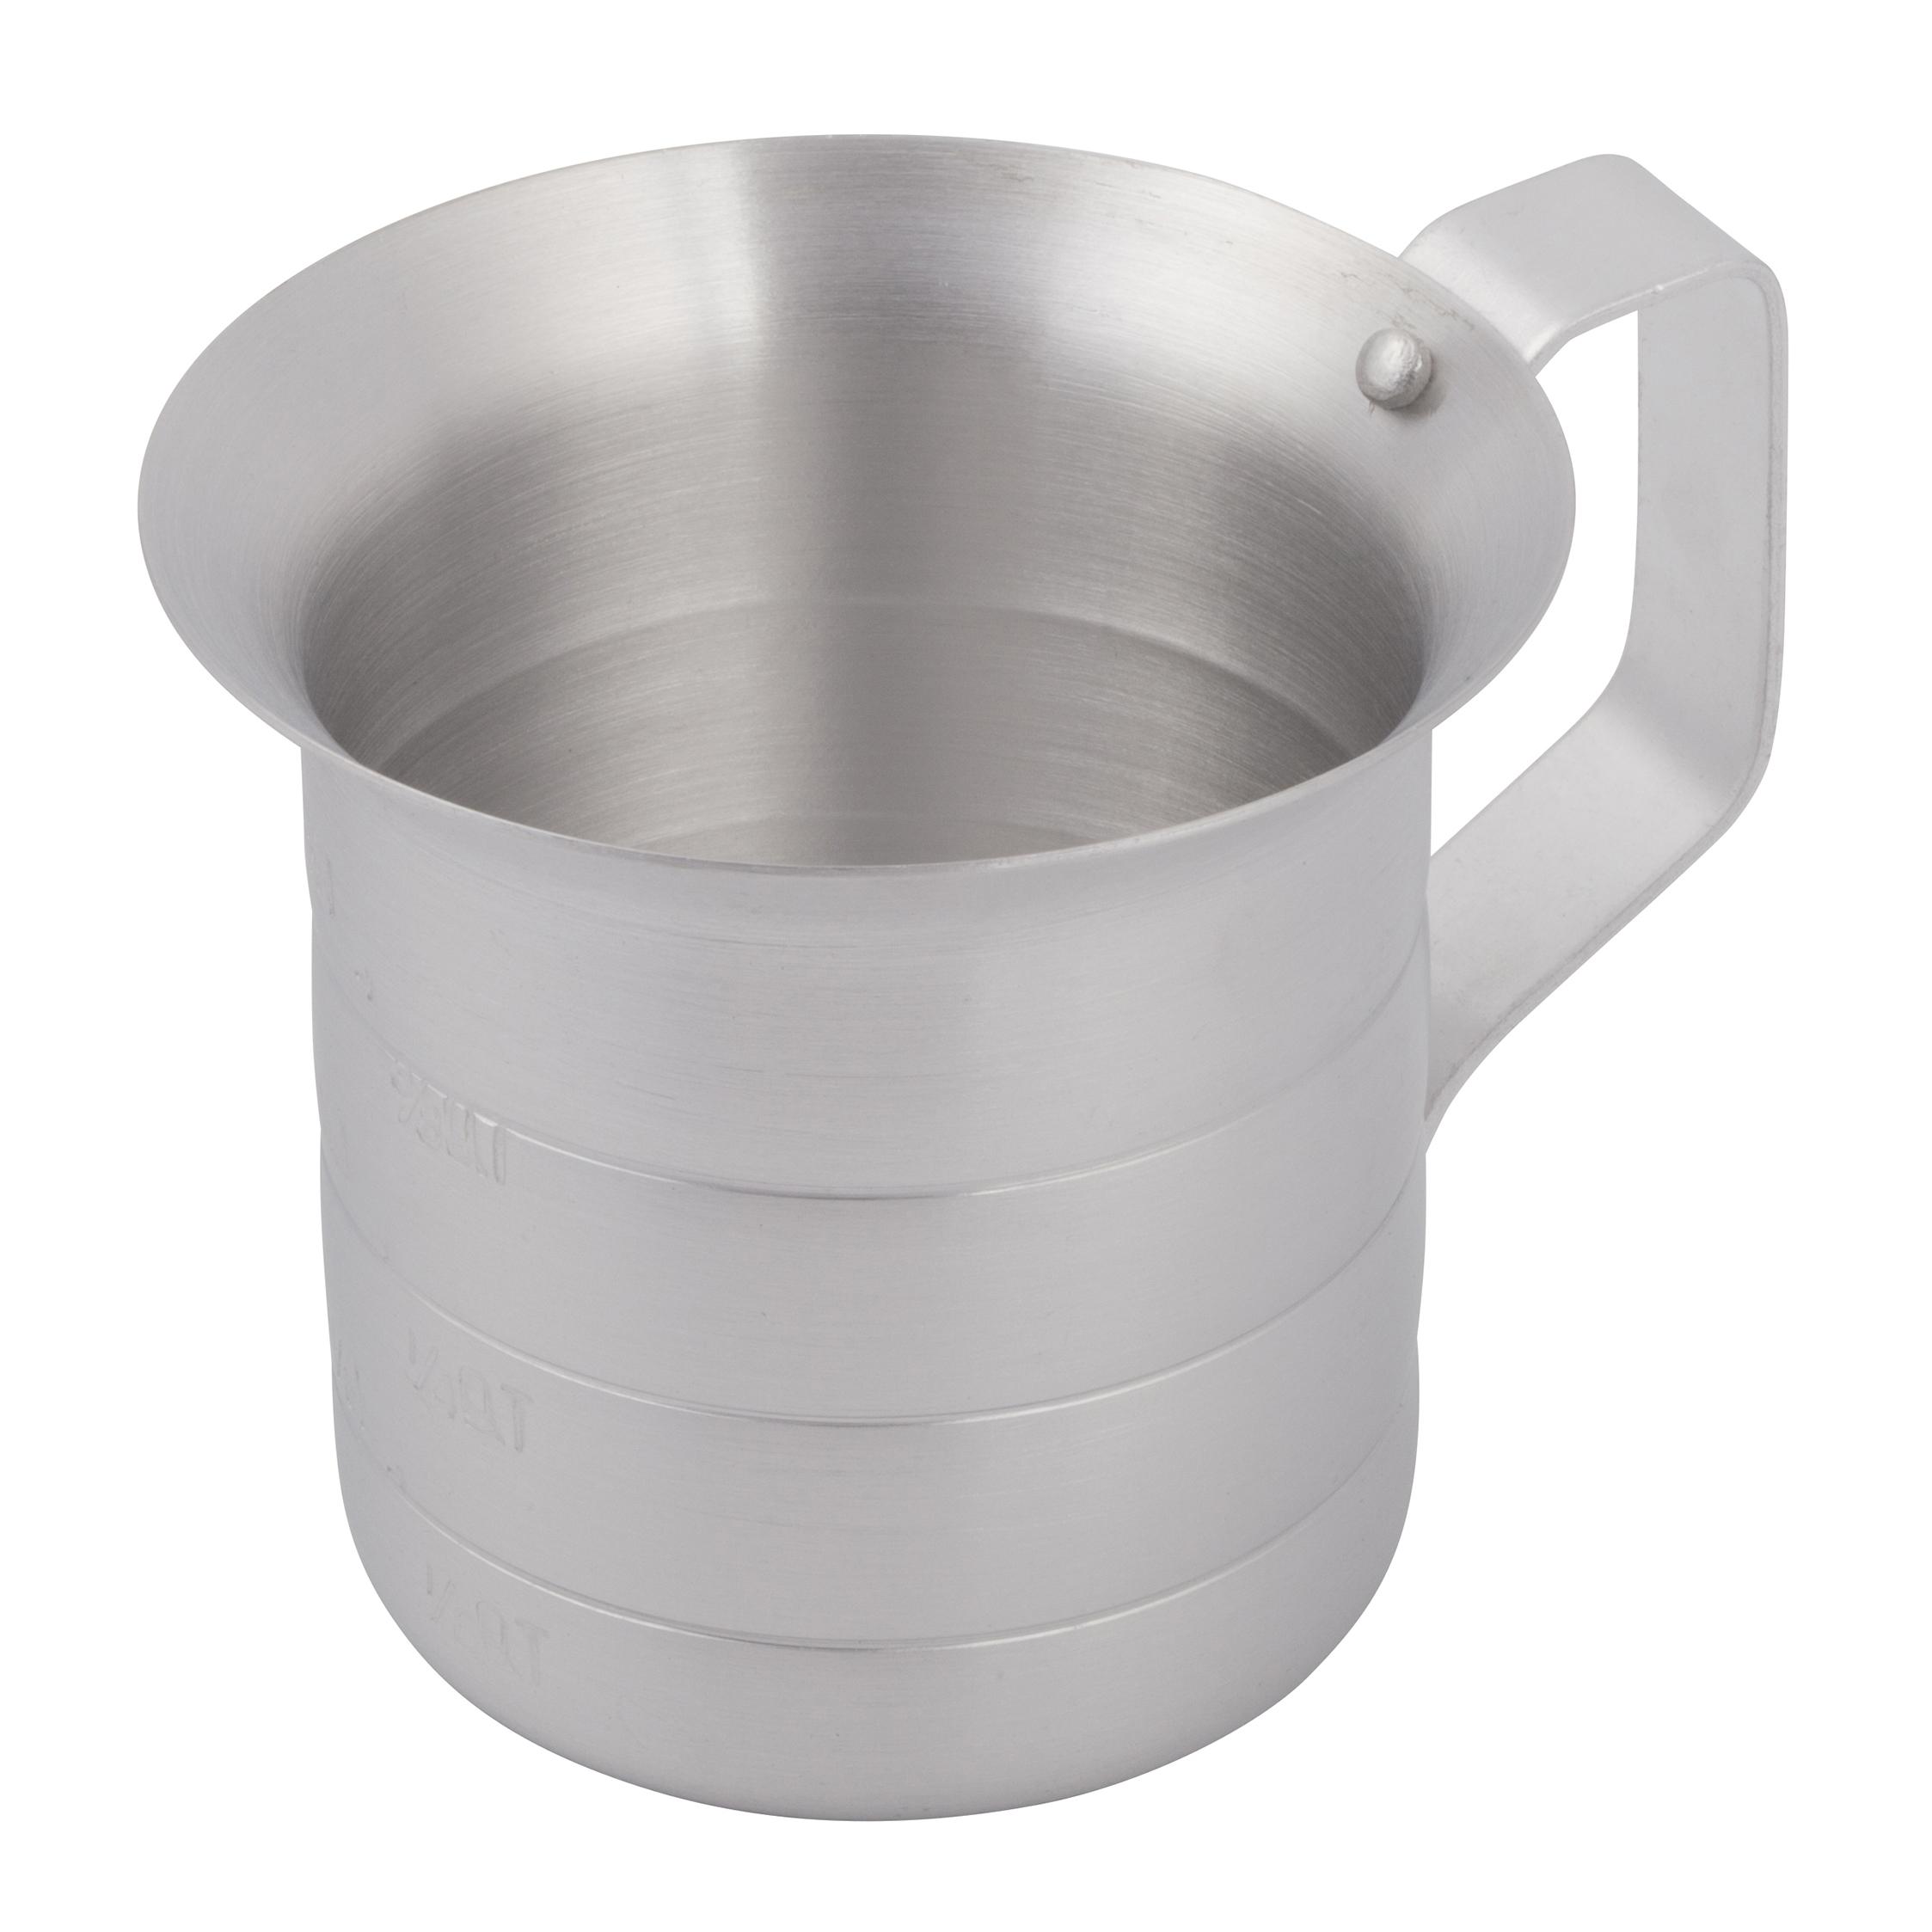 1750-10 Winco AM-05 measuring cups